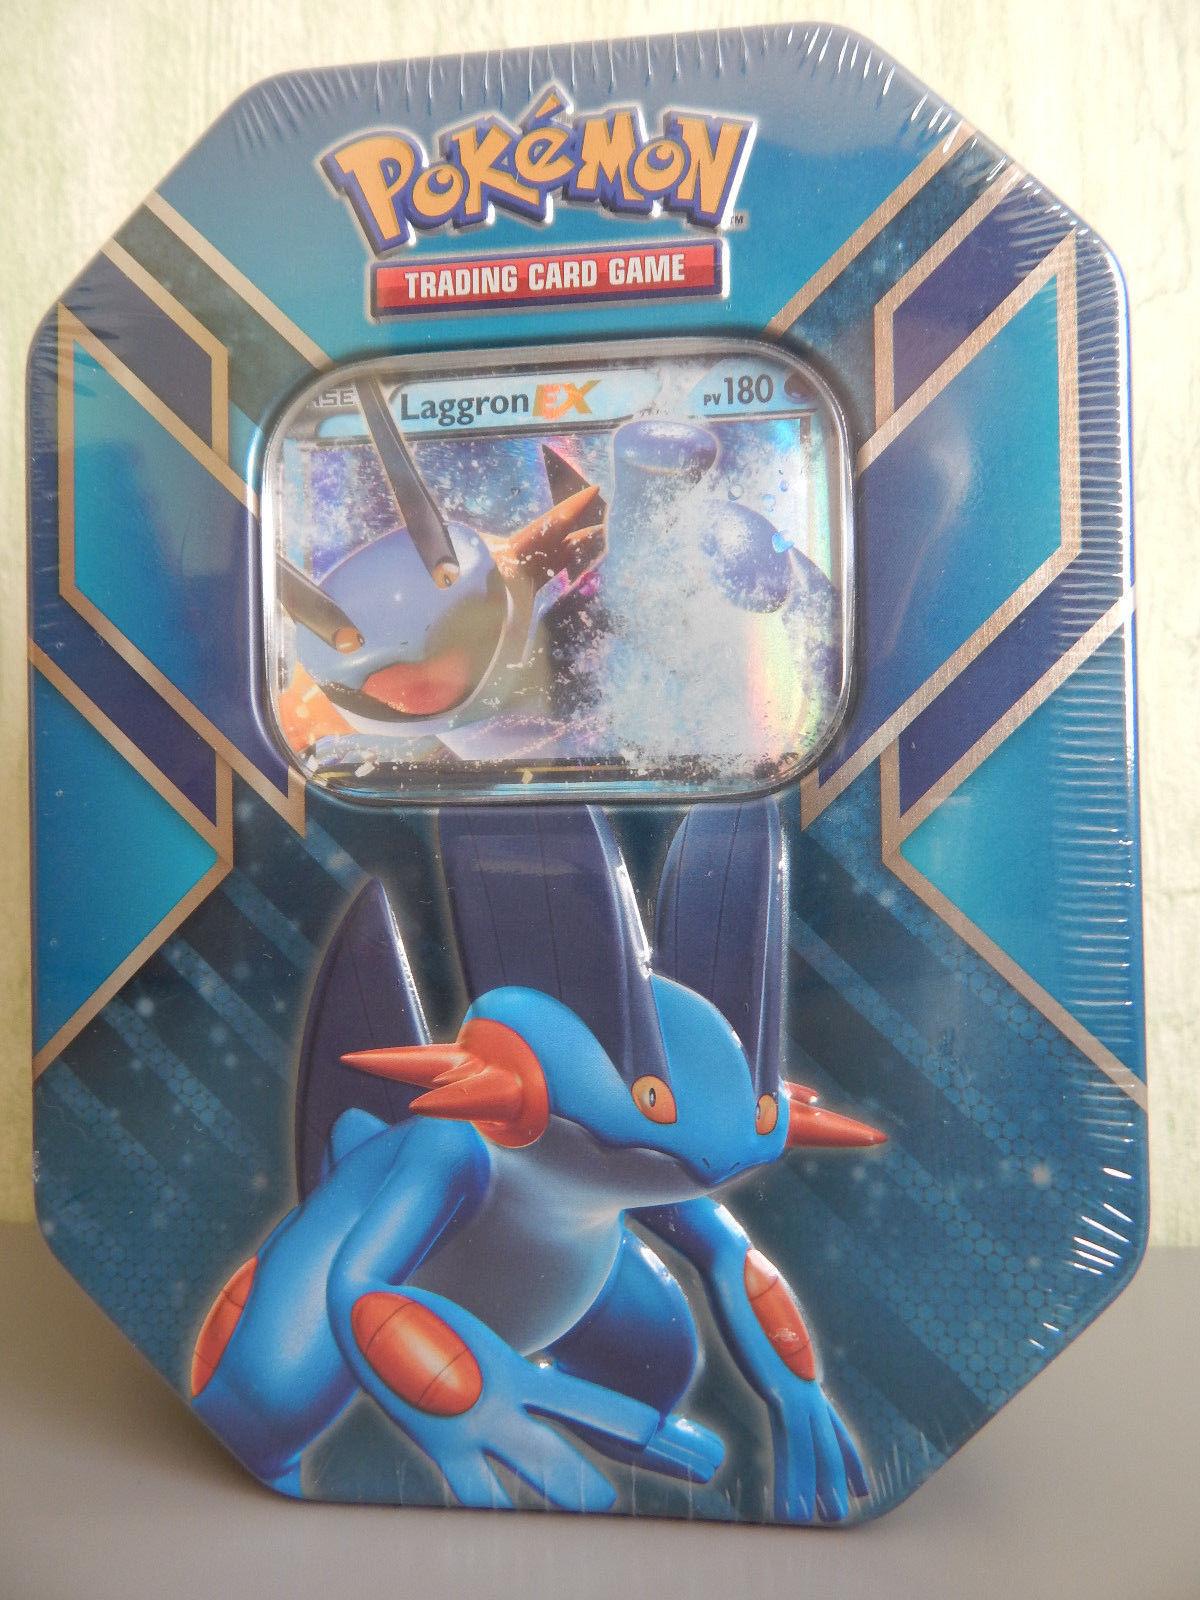 Pokémon pokebox laggron ex (4 förderer + carte promo) - scell é e fran ç ais